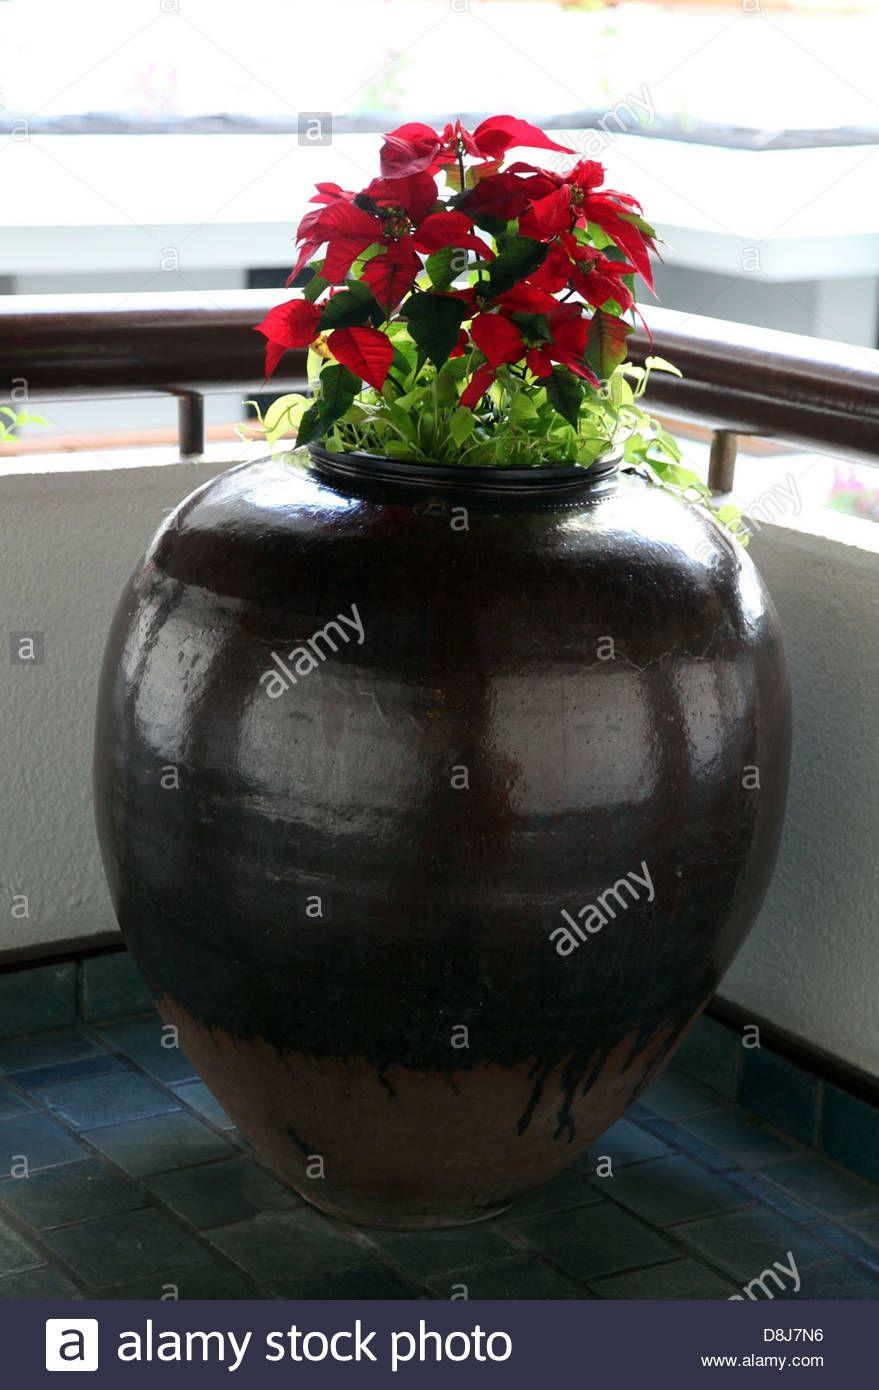 lenox single flower vase of wide glass vase pictures living room vases wholesale new h vases big with wide glass vase pictures corner big flower vase vase pinterest of wide glass vase pictur